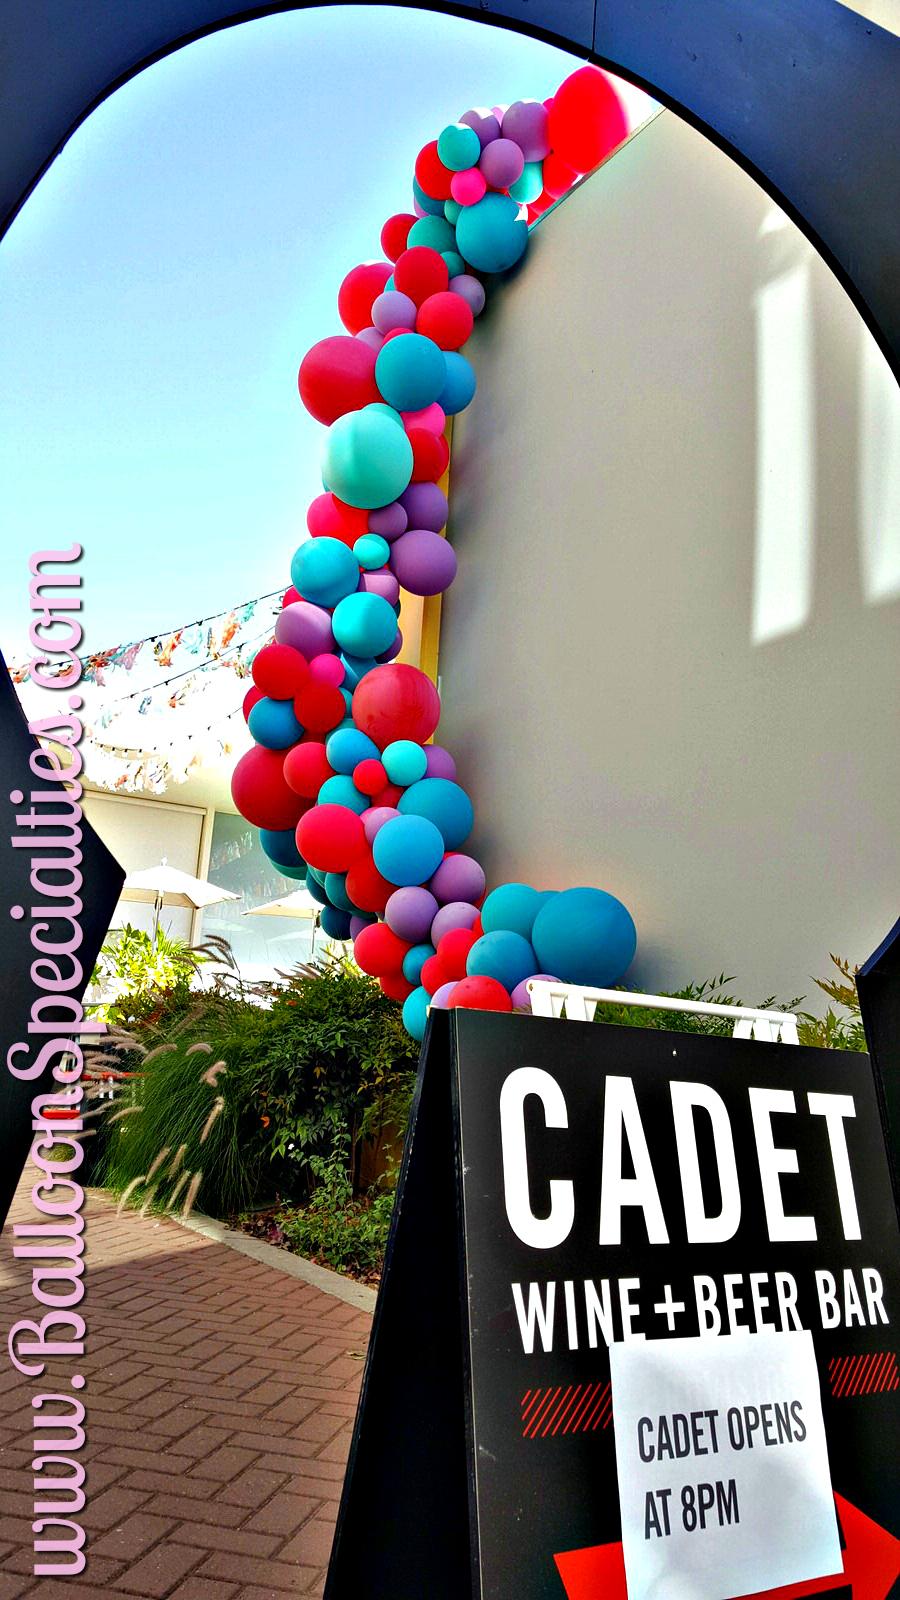 Cadet Wine Bar Balloon Garland Side View Napa Valley Zim Balloons.jpg